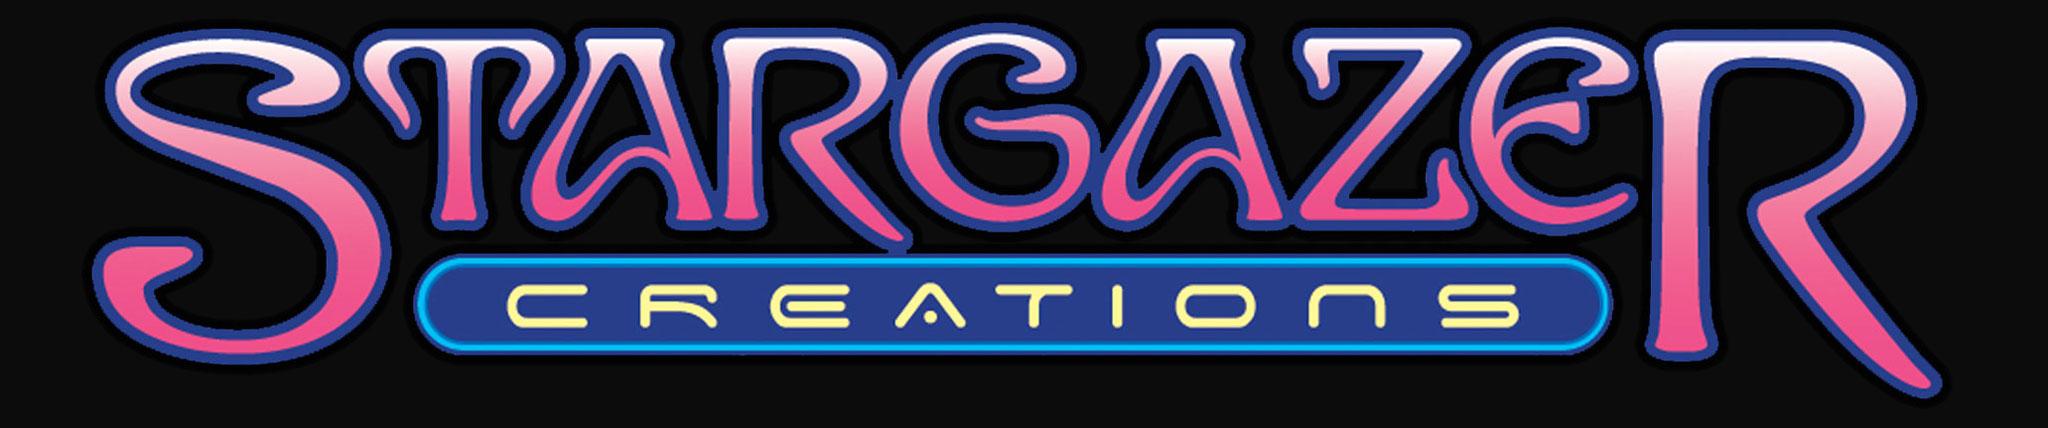 Stargazer Creations Logo